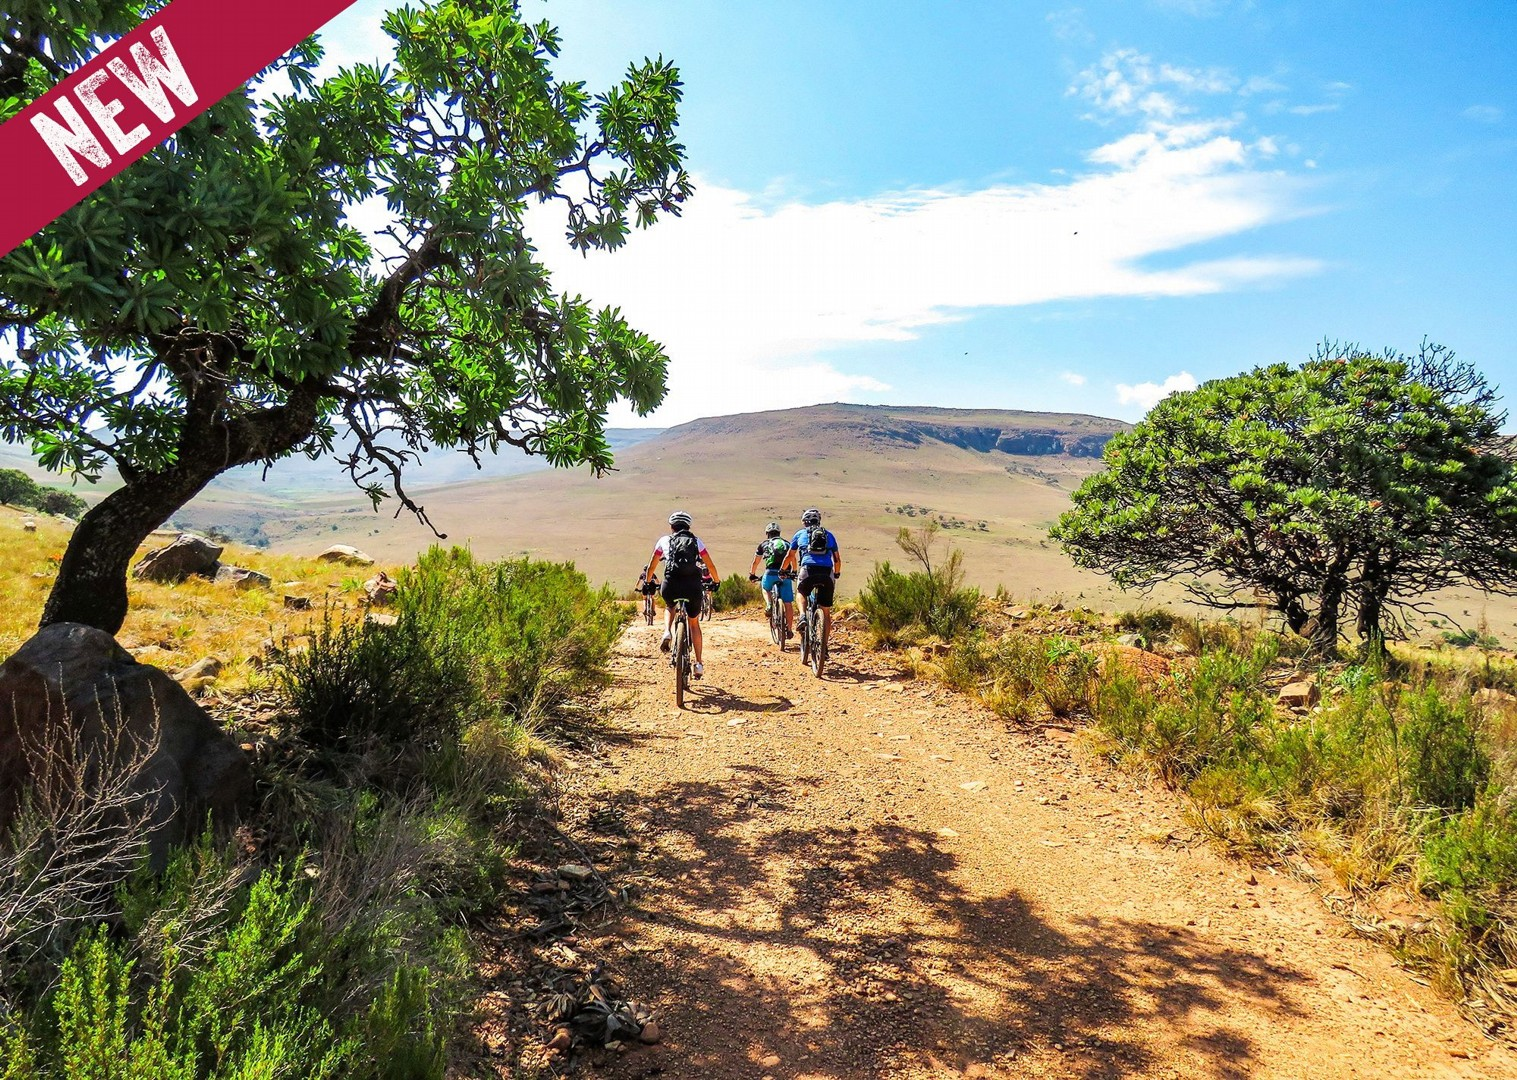 guided-mountain-bike-south-africa-and-botswana-holiday.jpg - NEW! South Africa and Botswana - Mountain Biking